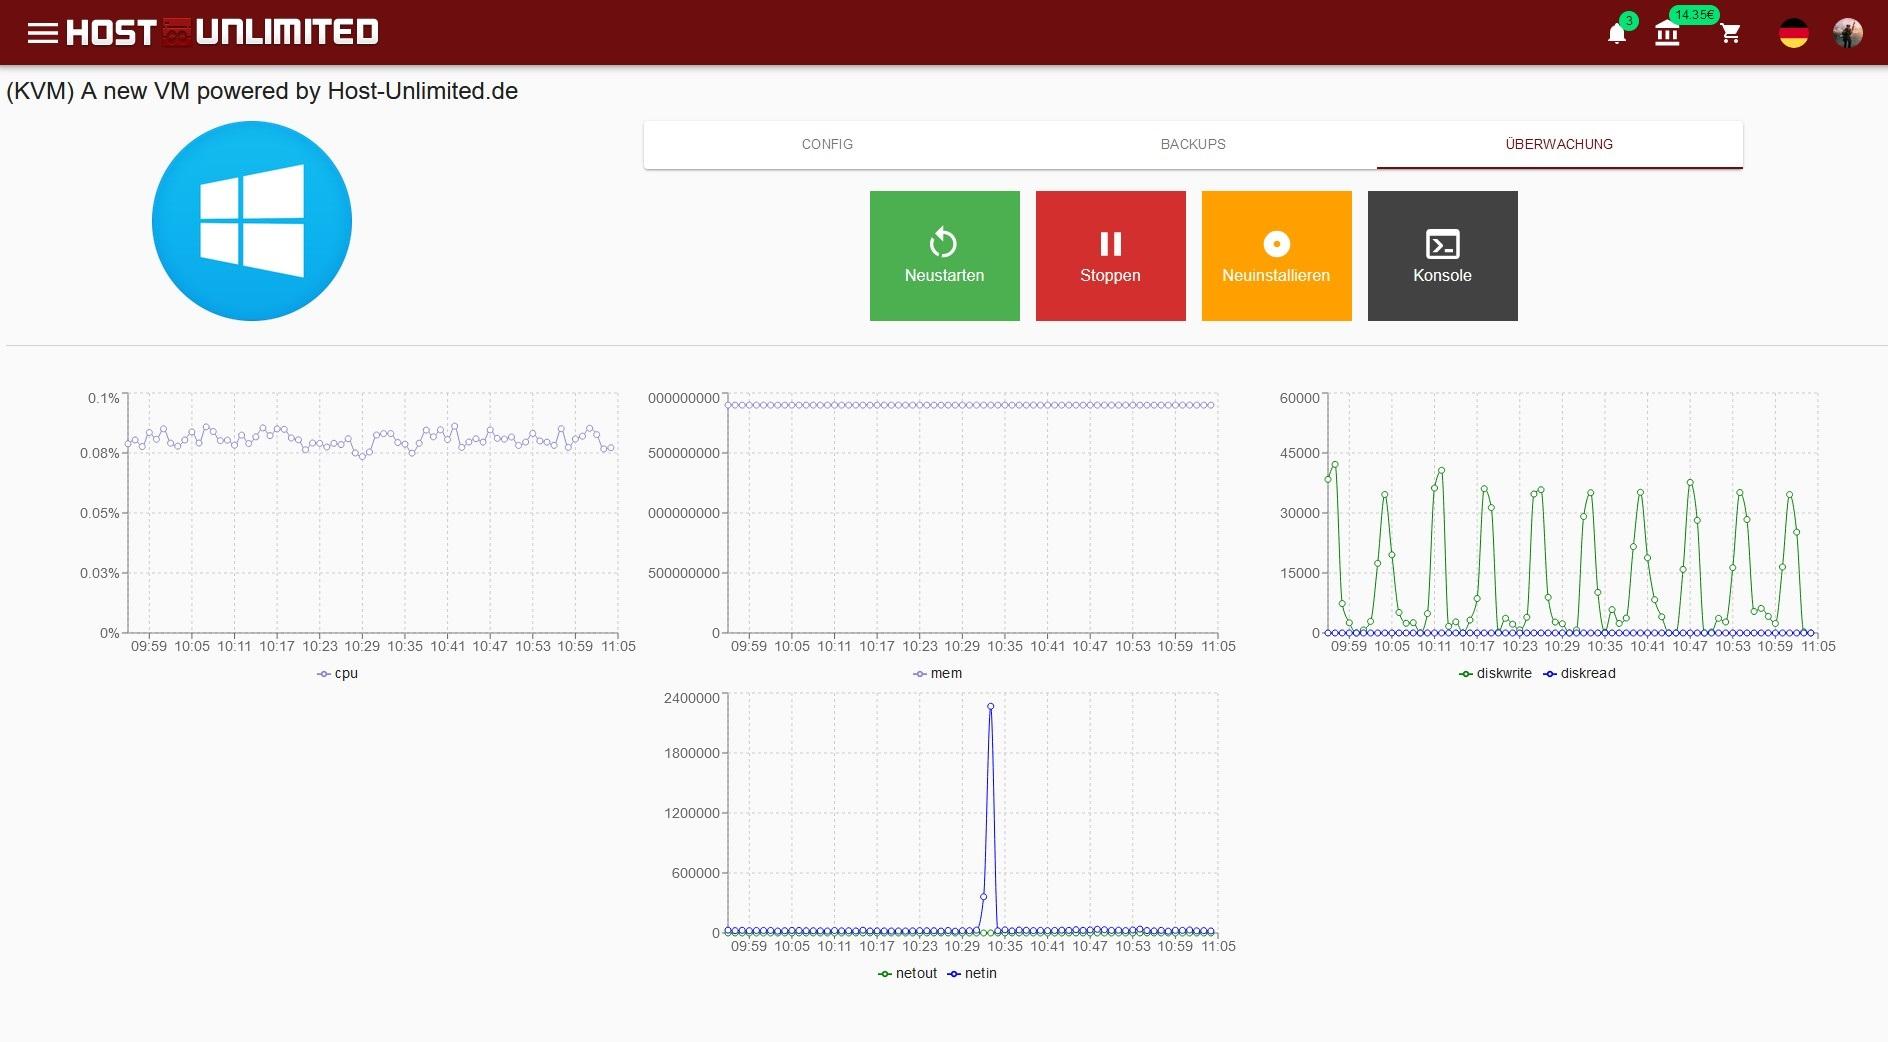 vps-webinterface-screenshot1